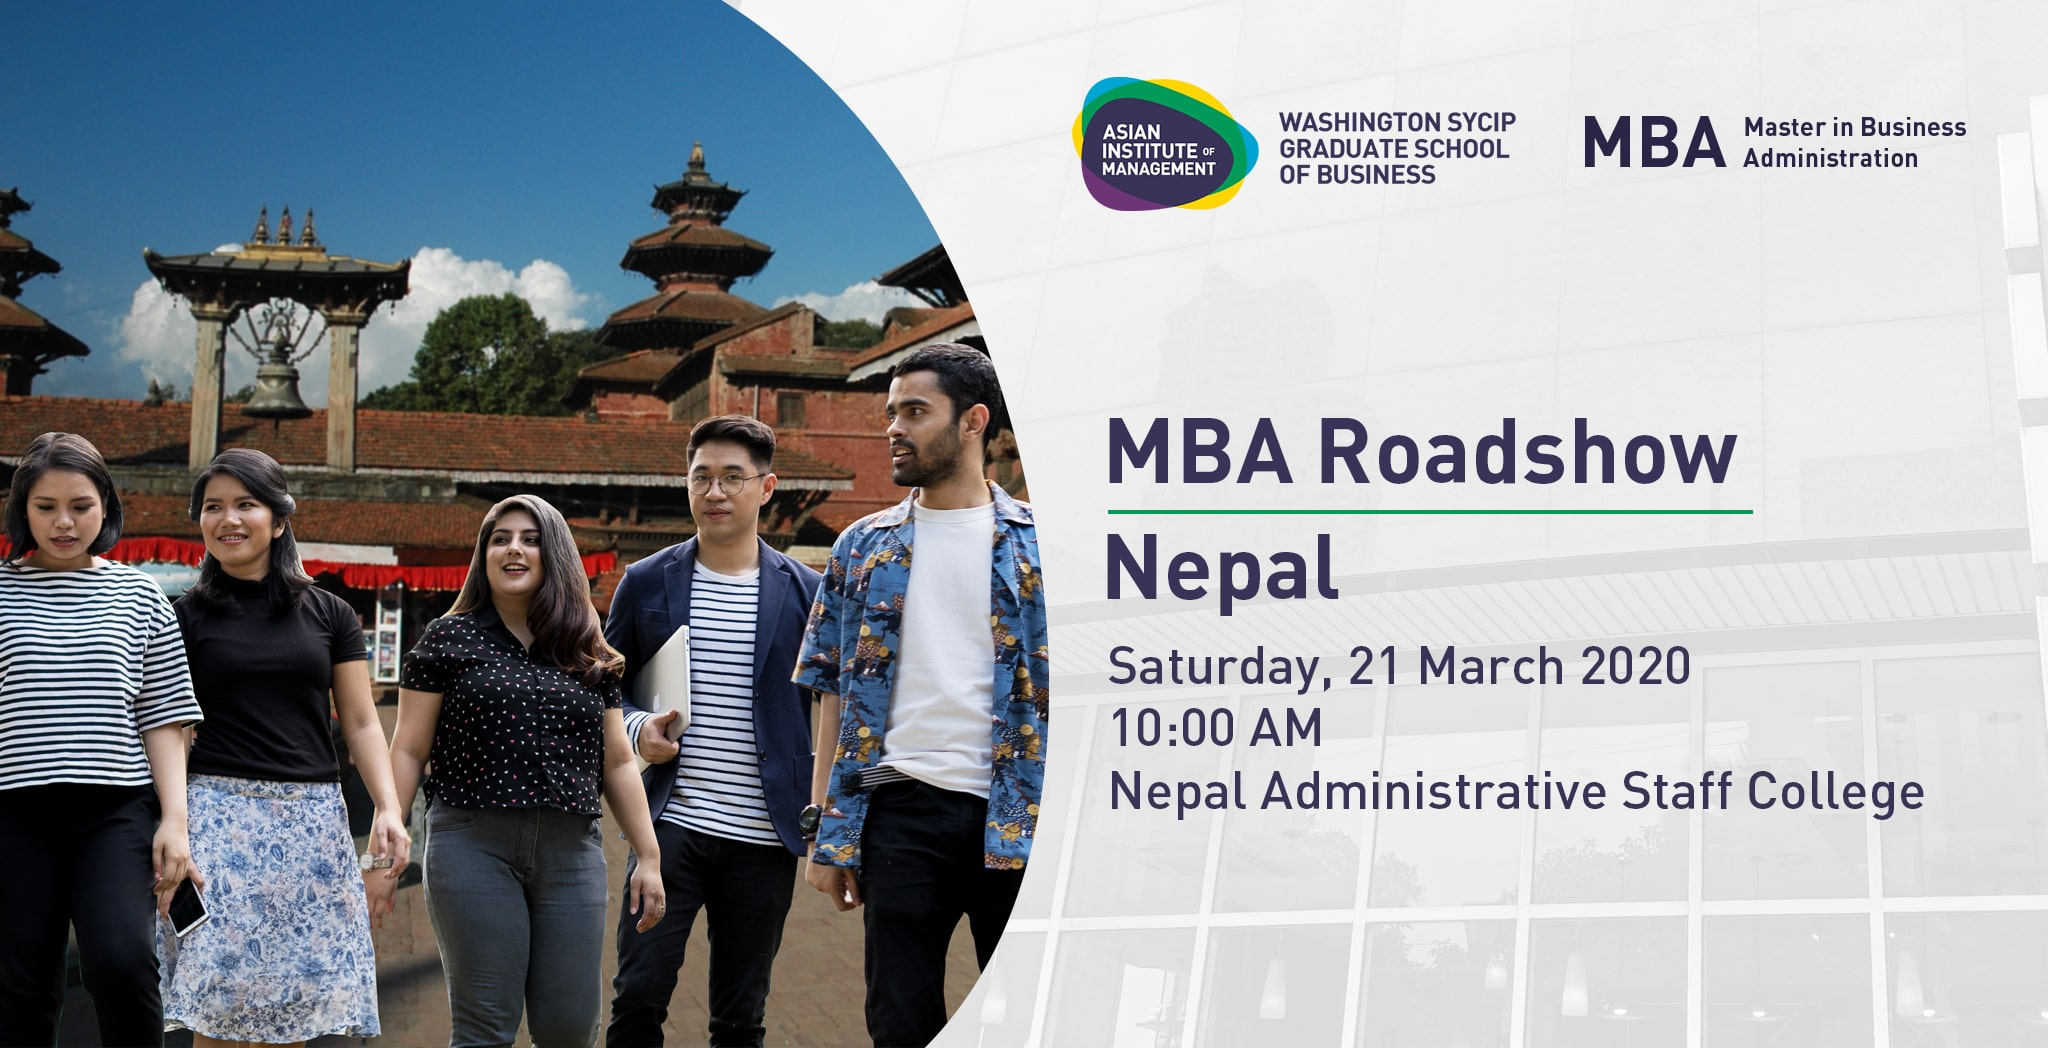 MBA Roadshow Nepal